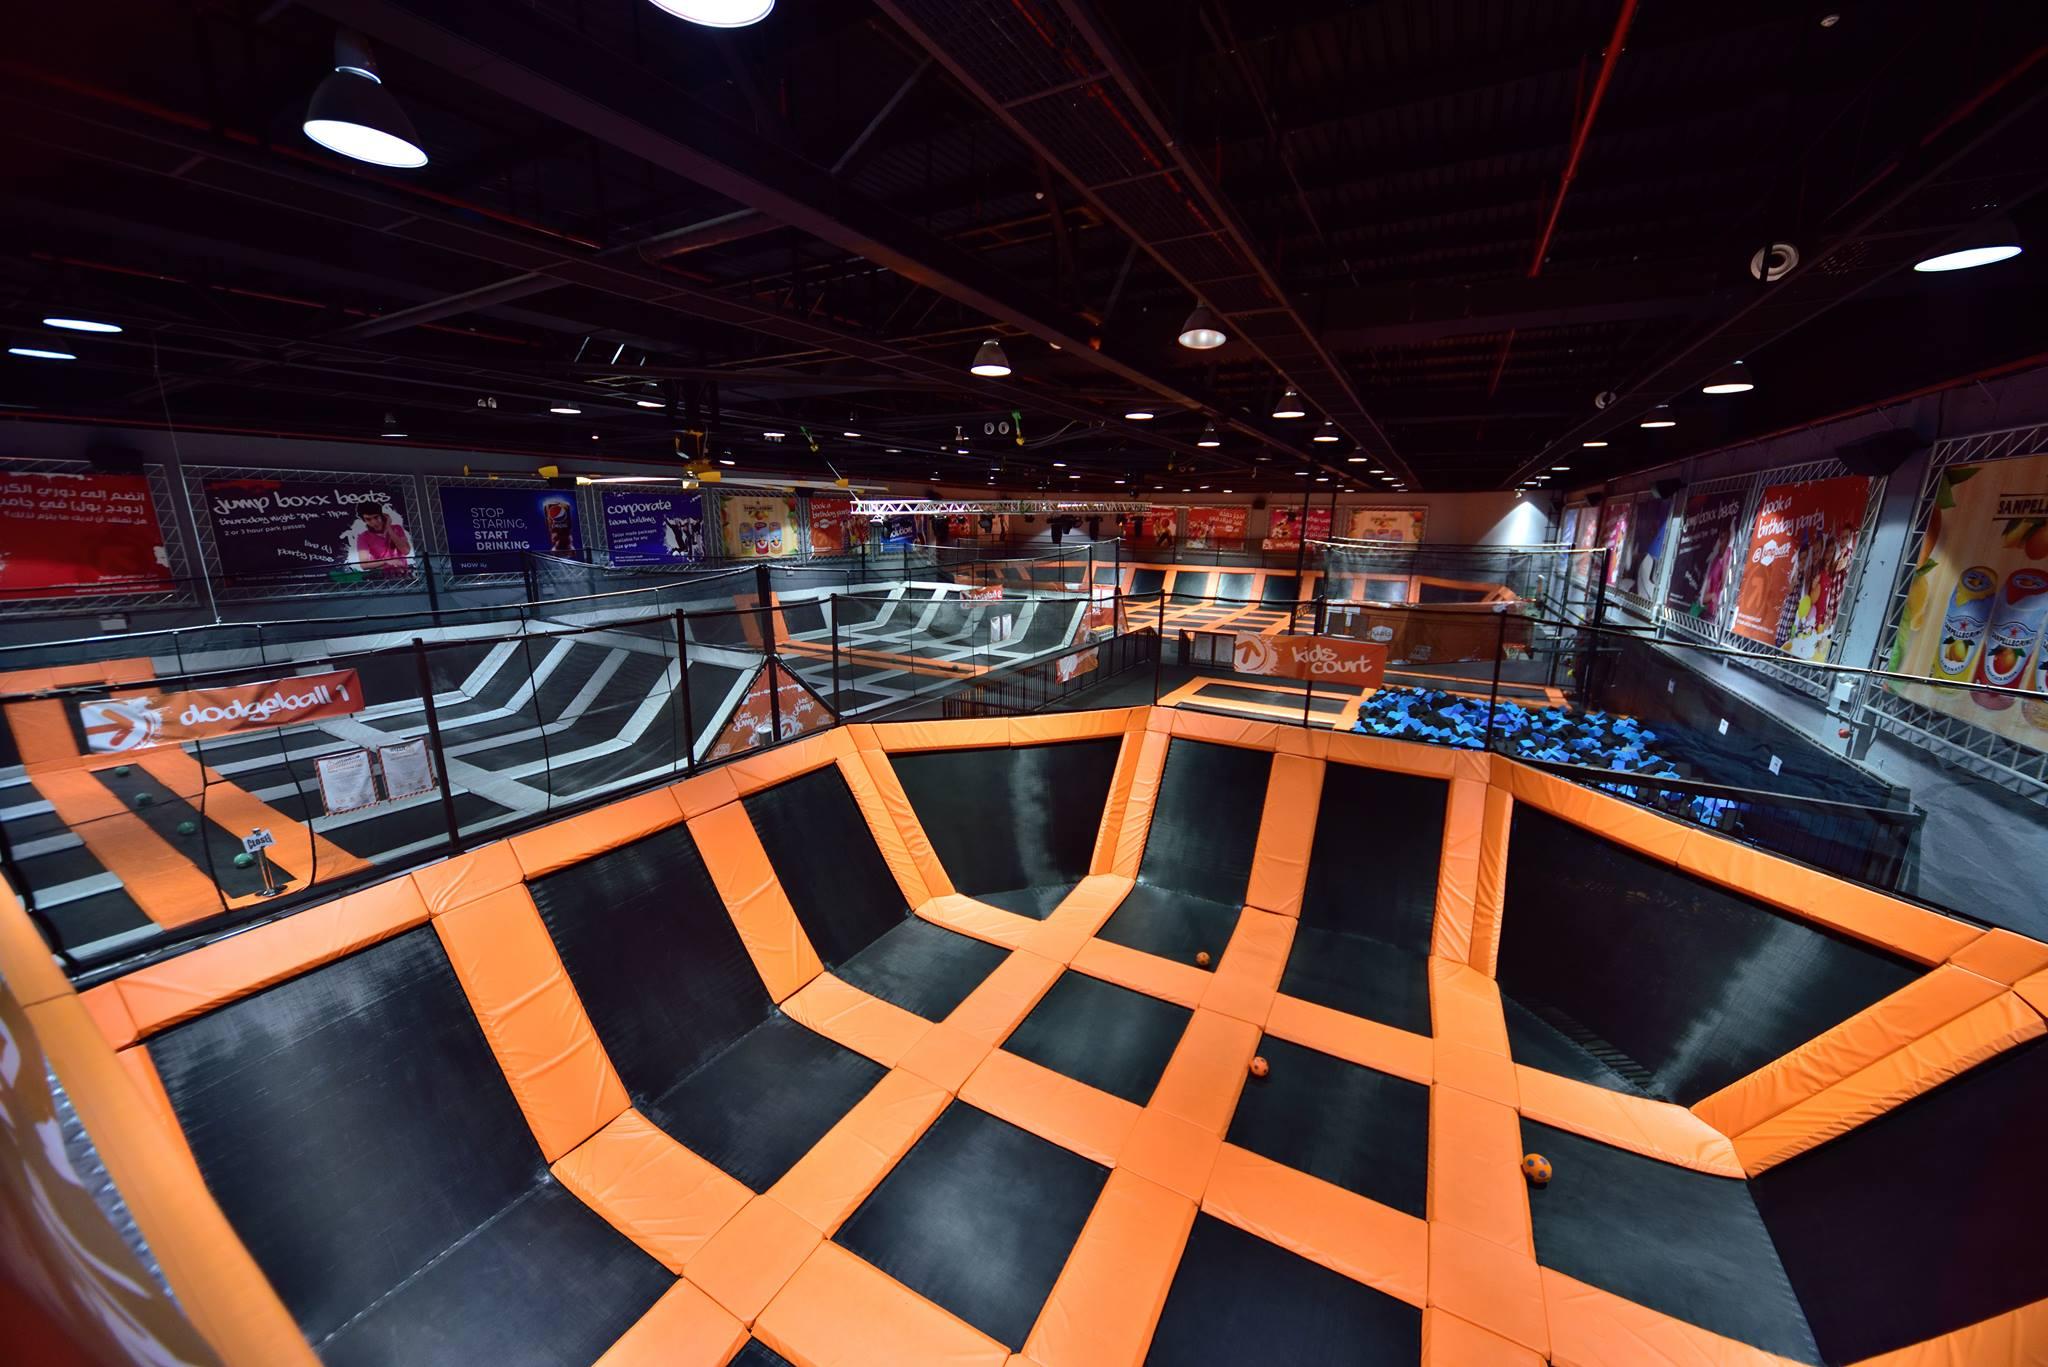 Jump Boxx trampoline park Dubai